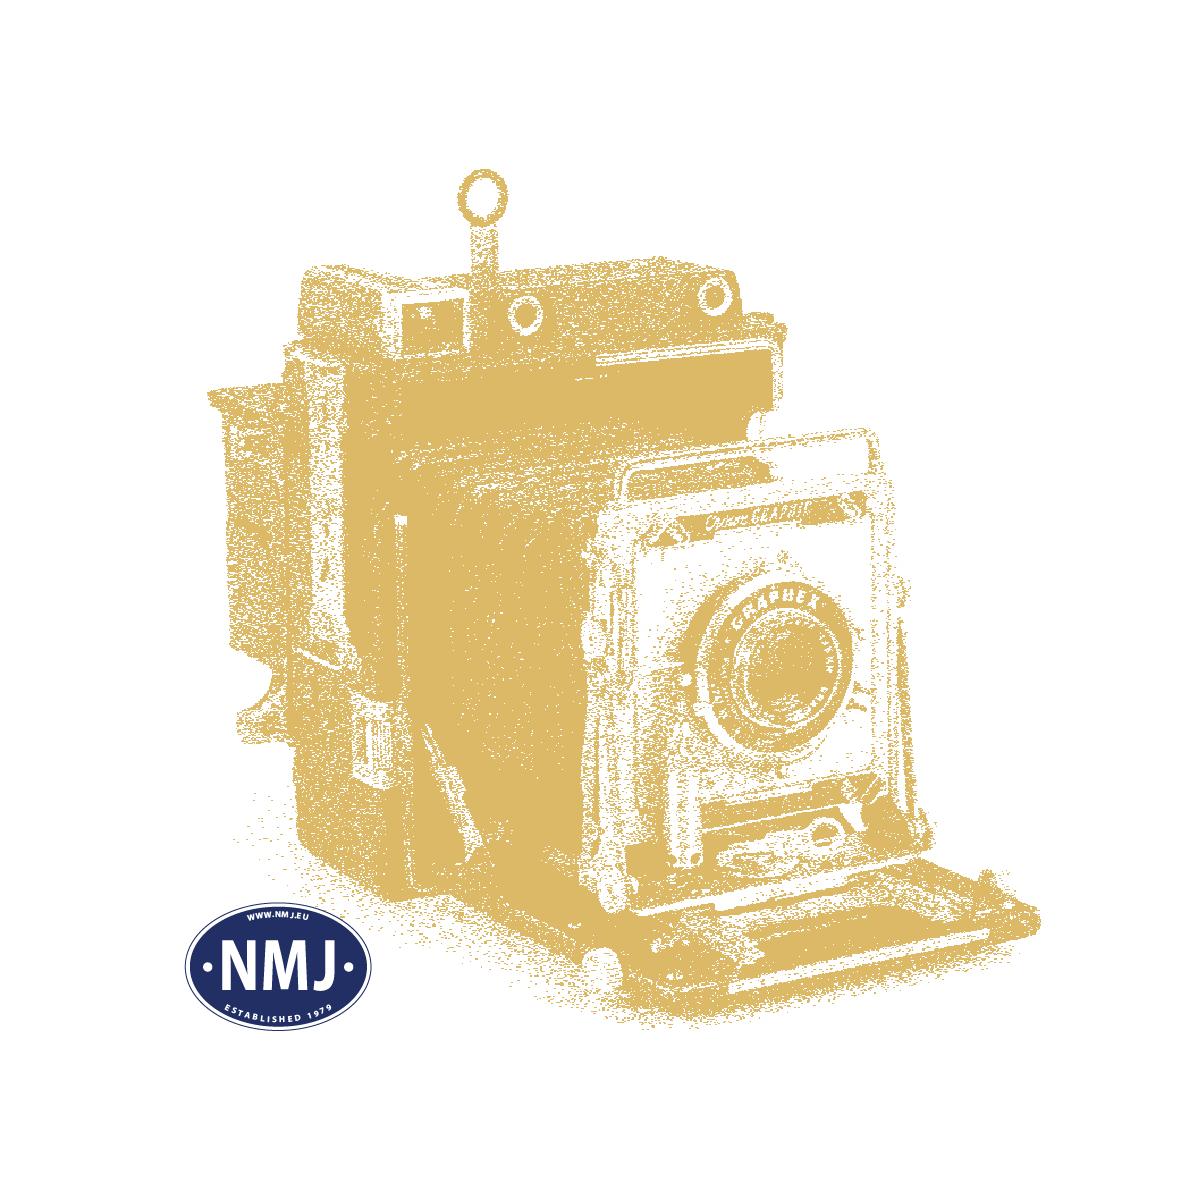 DK-H0-L0002AL - HFHJ MX 19, AC w/ Sound